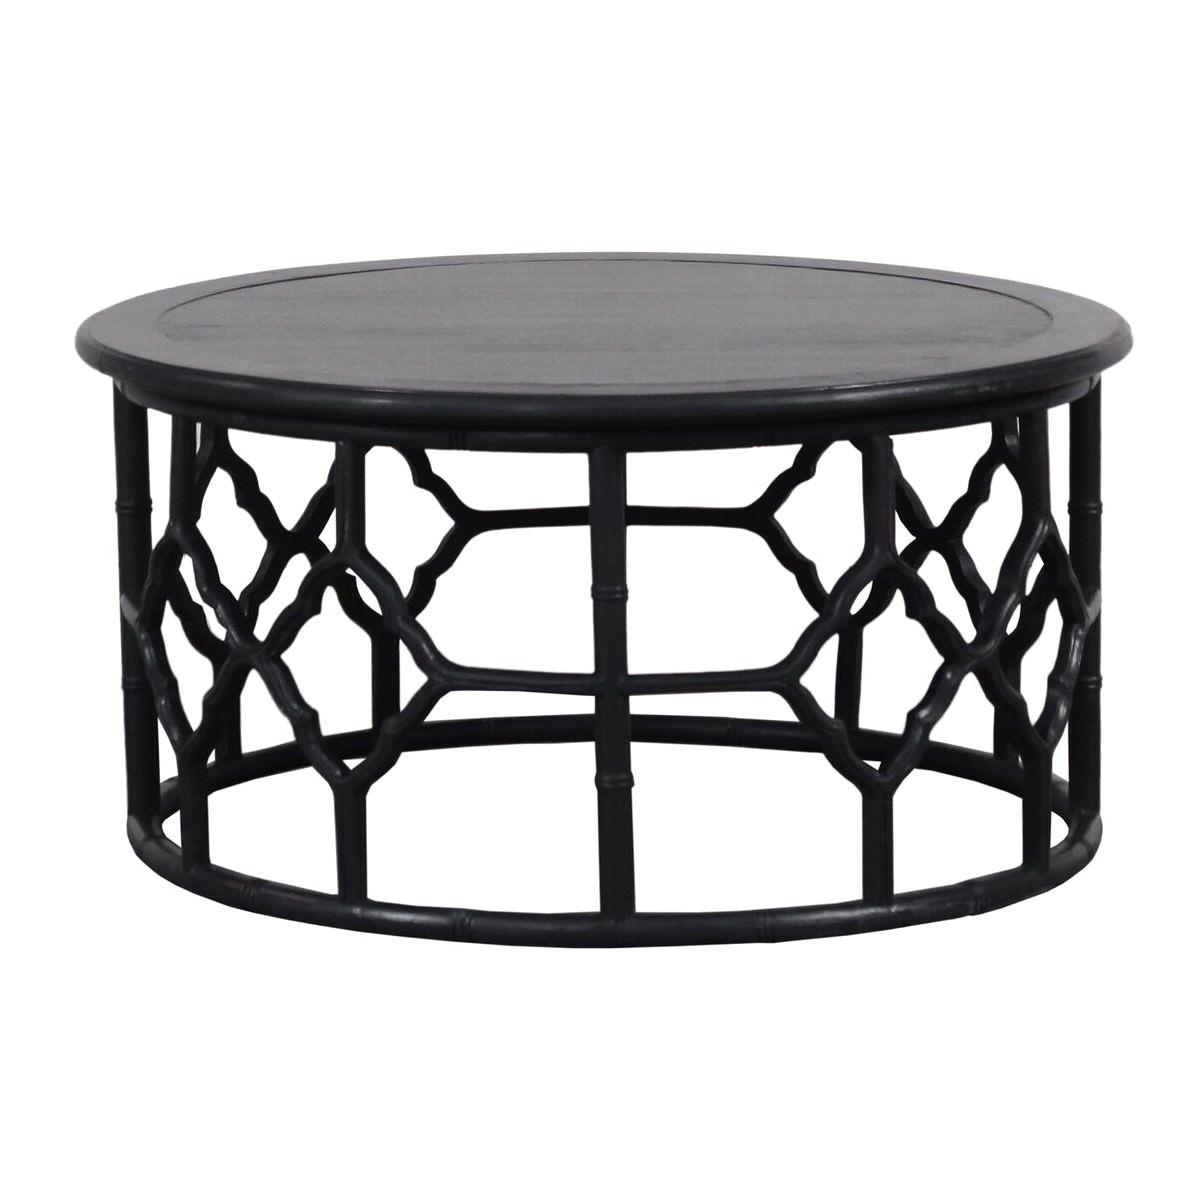 Junzi Mahogany Timber Oriental Round Coffee Table, 90cm, Black